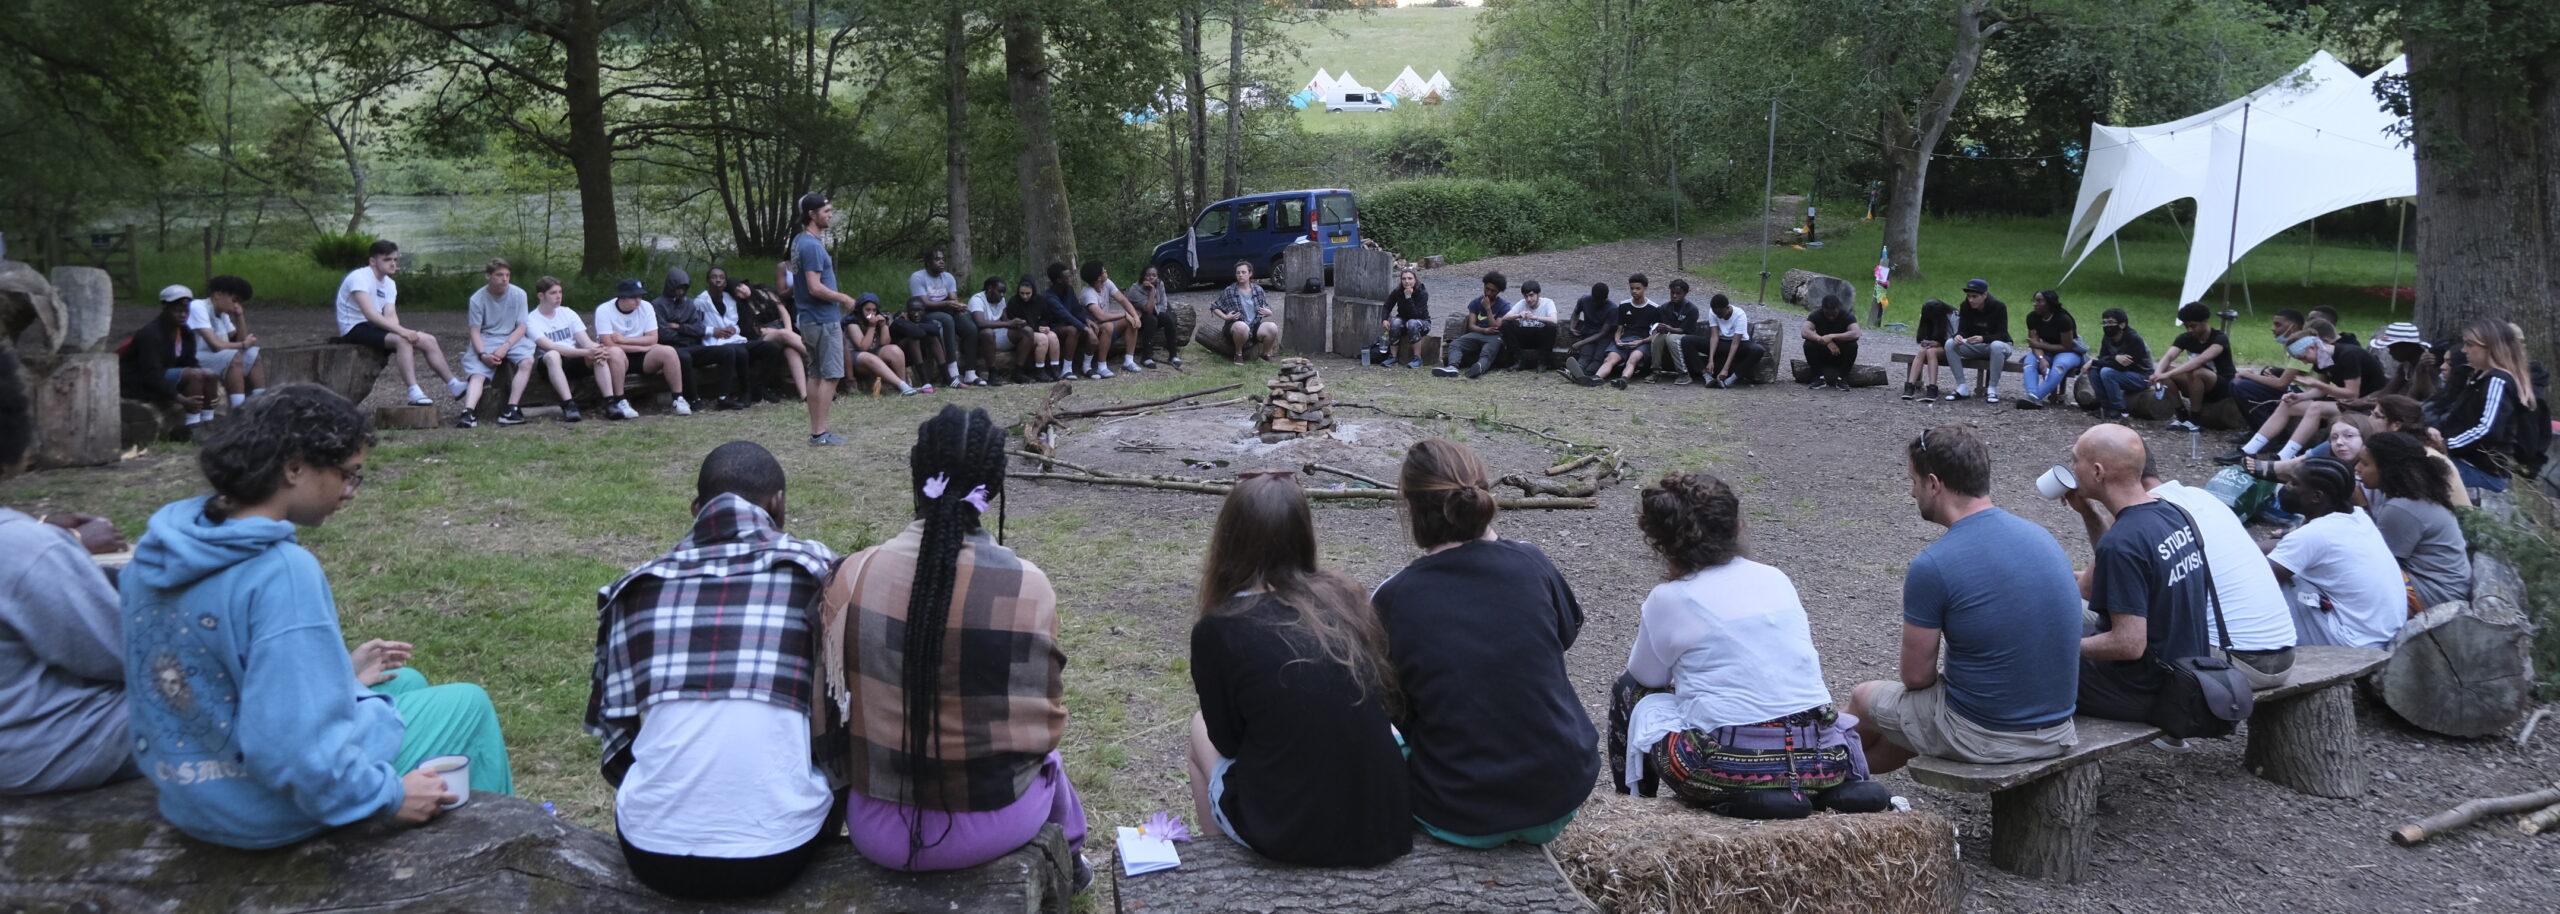 talking circle outdoors